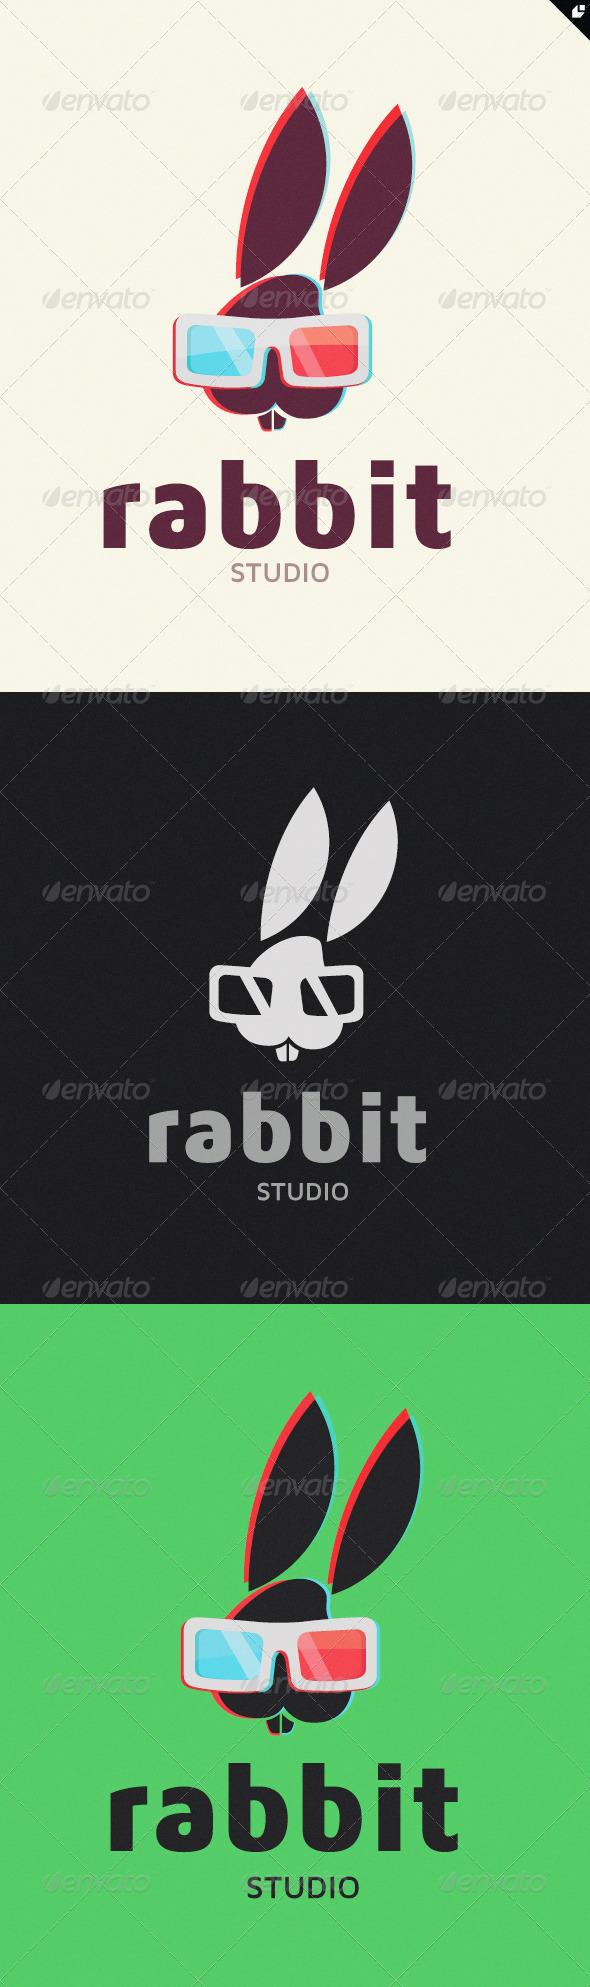 Rabbit Studio Logo